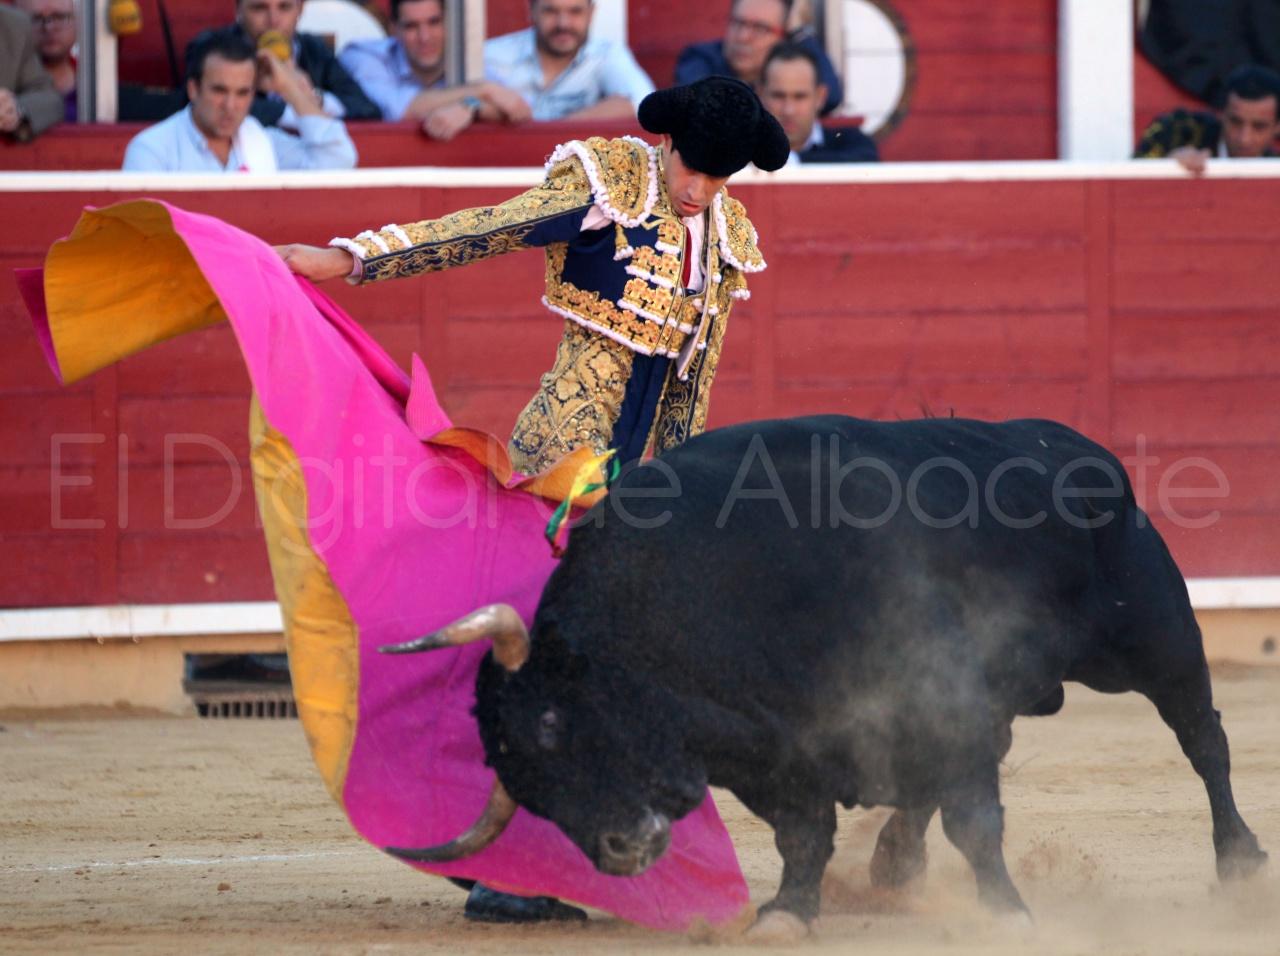 El Juli Lopez Simon y Garrido Feria Albacete 2015 toros  27